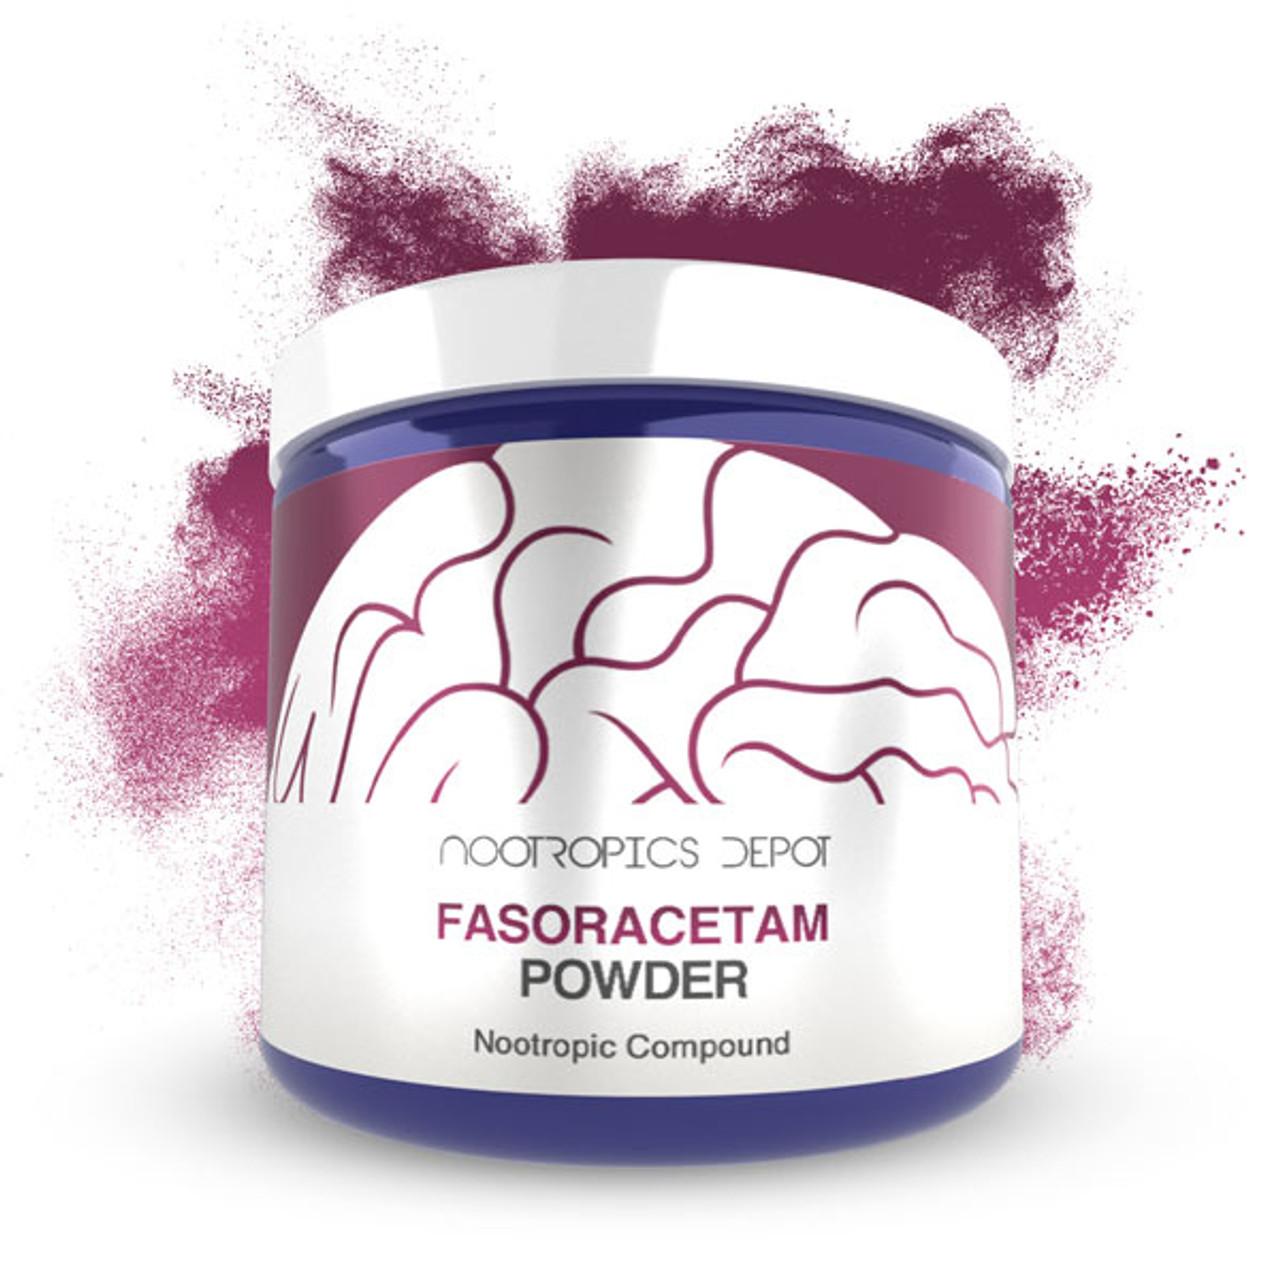 Fasoracetam Powder